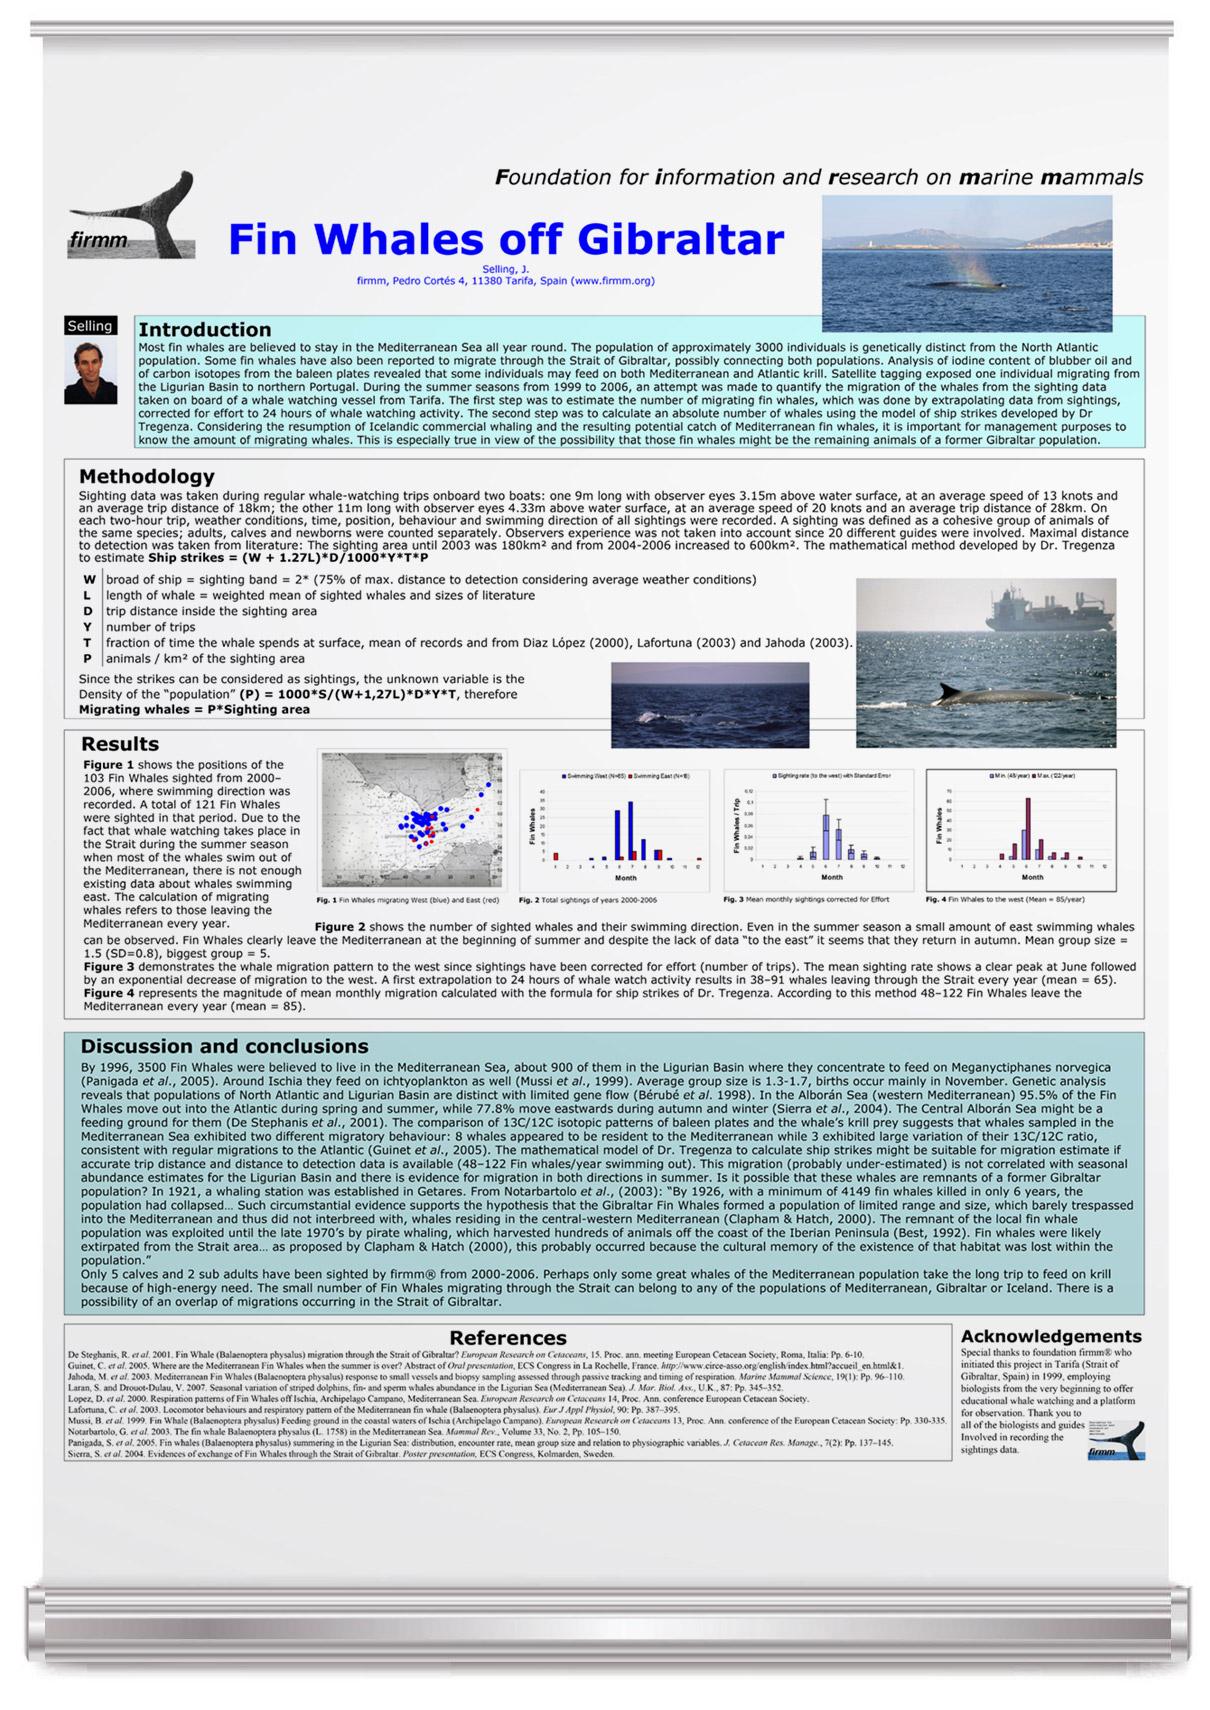 Fin Whales off Gibraltar